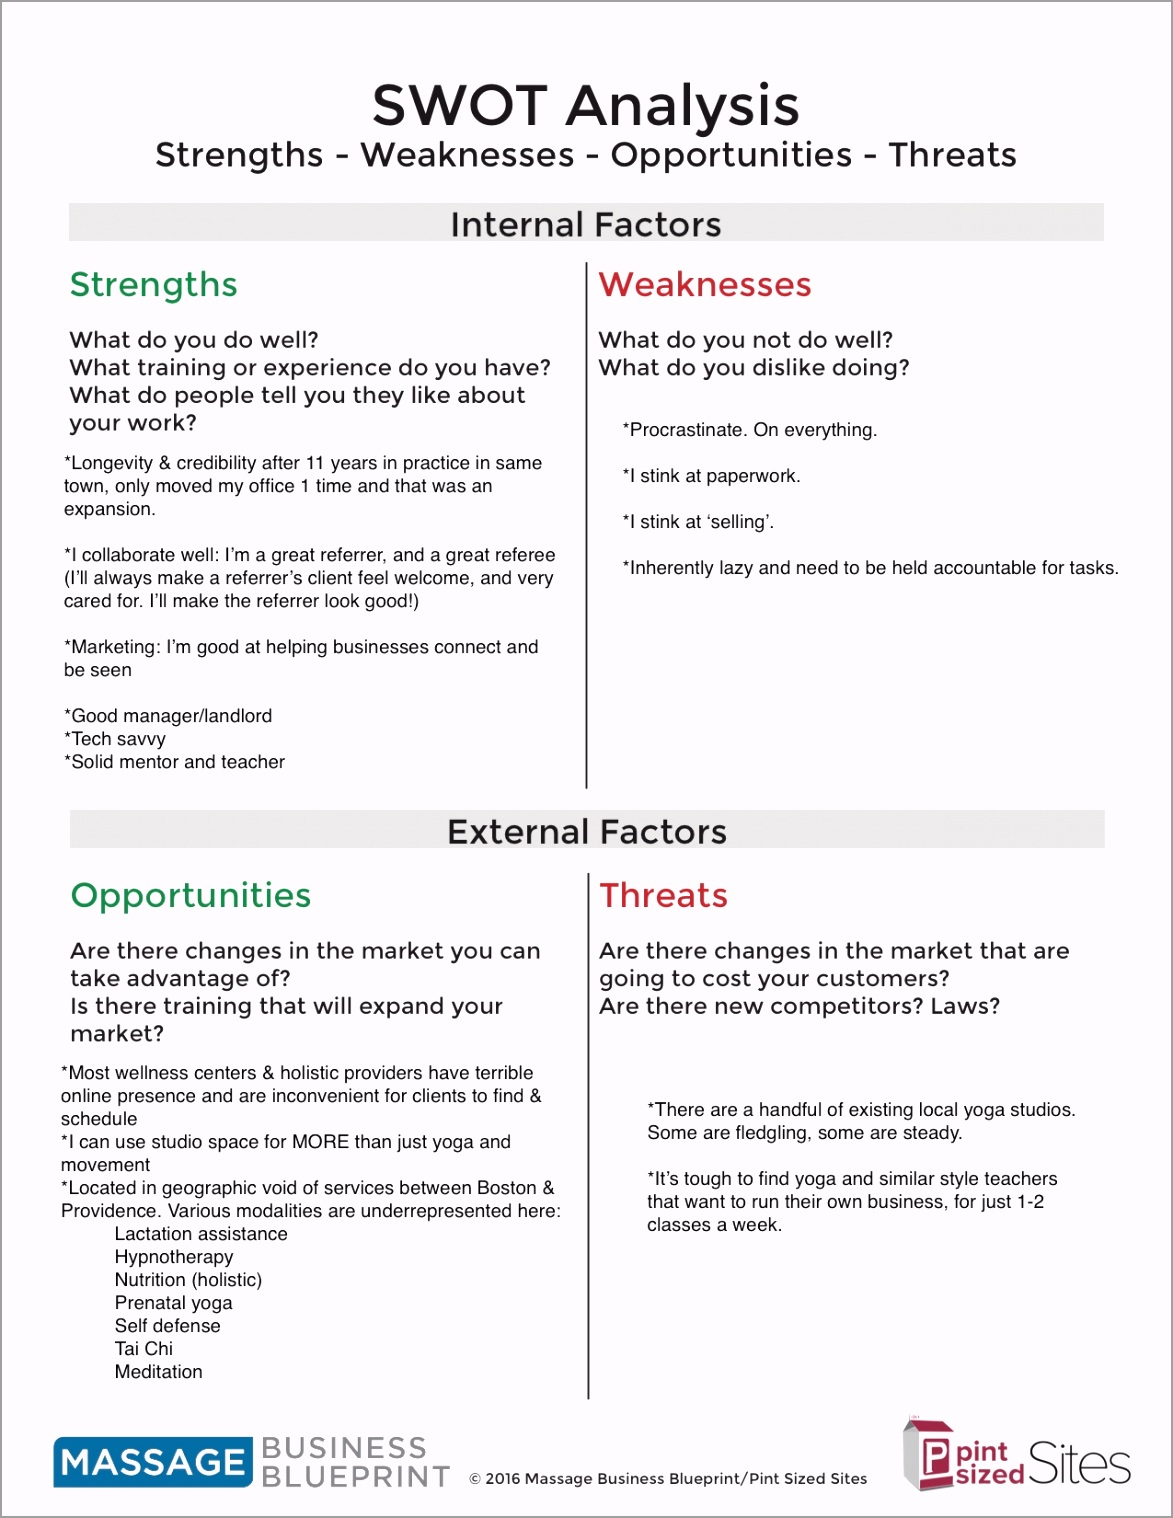 Manager SWOT Analysis Worksheet Example ruiiy